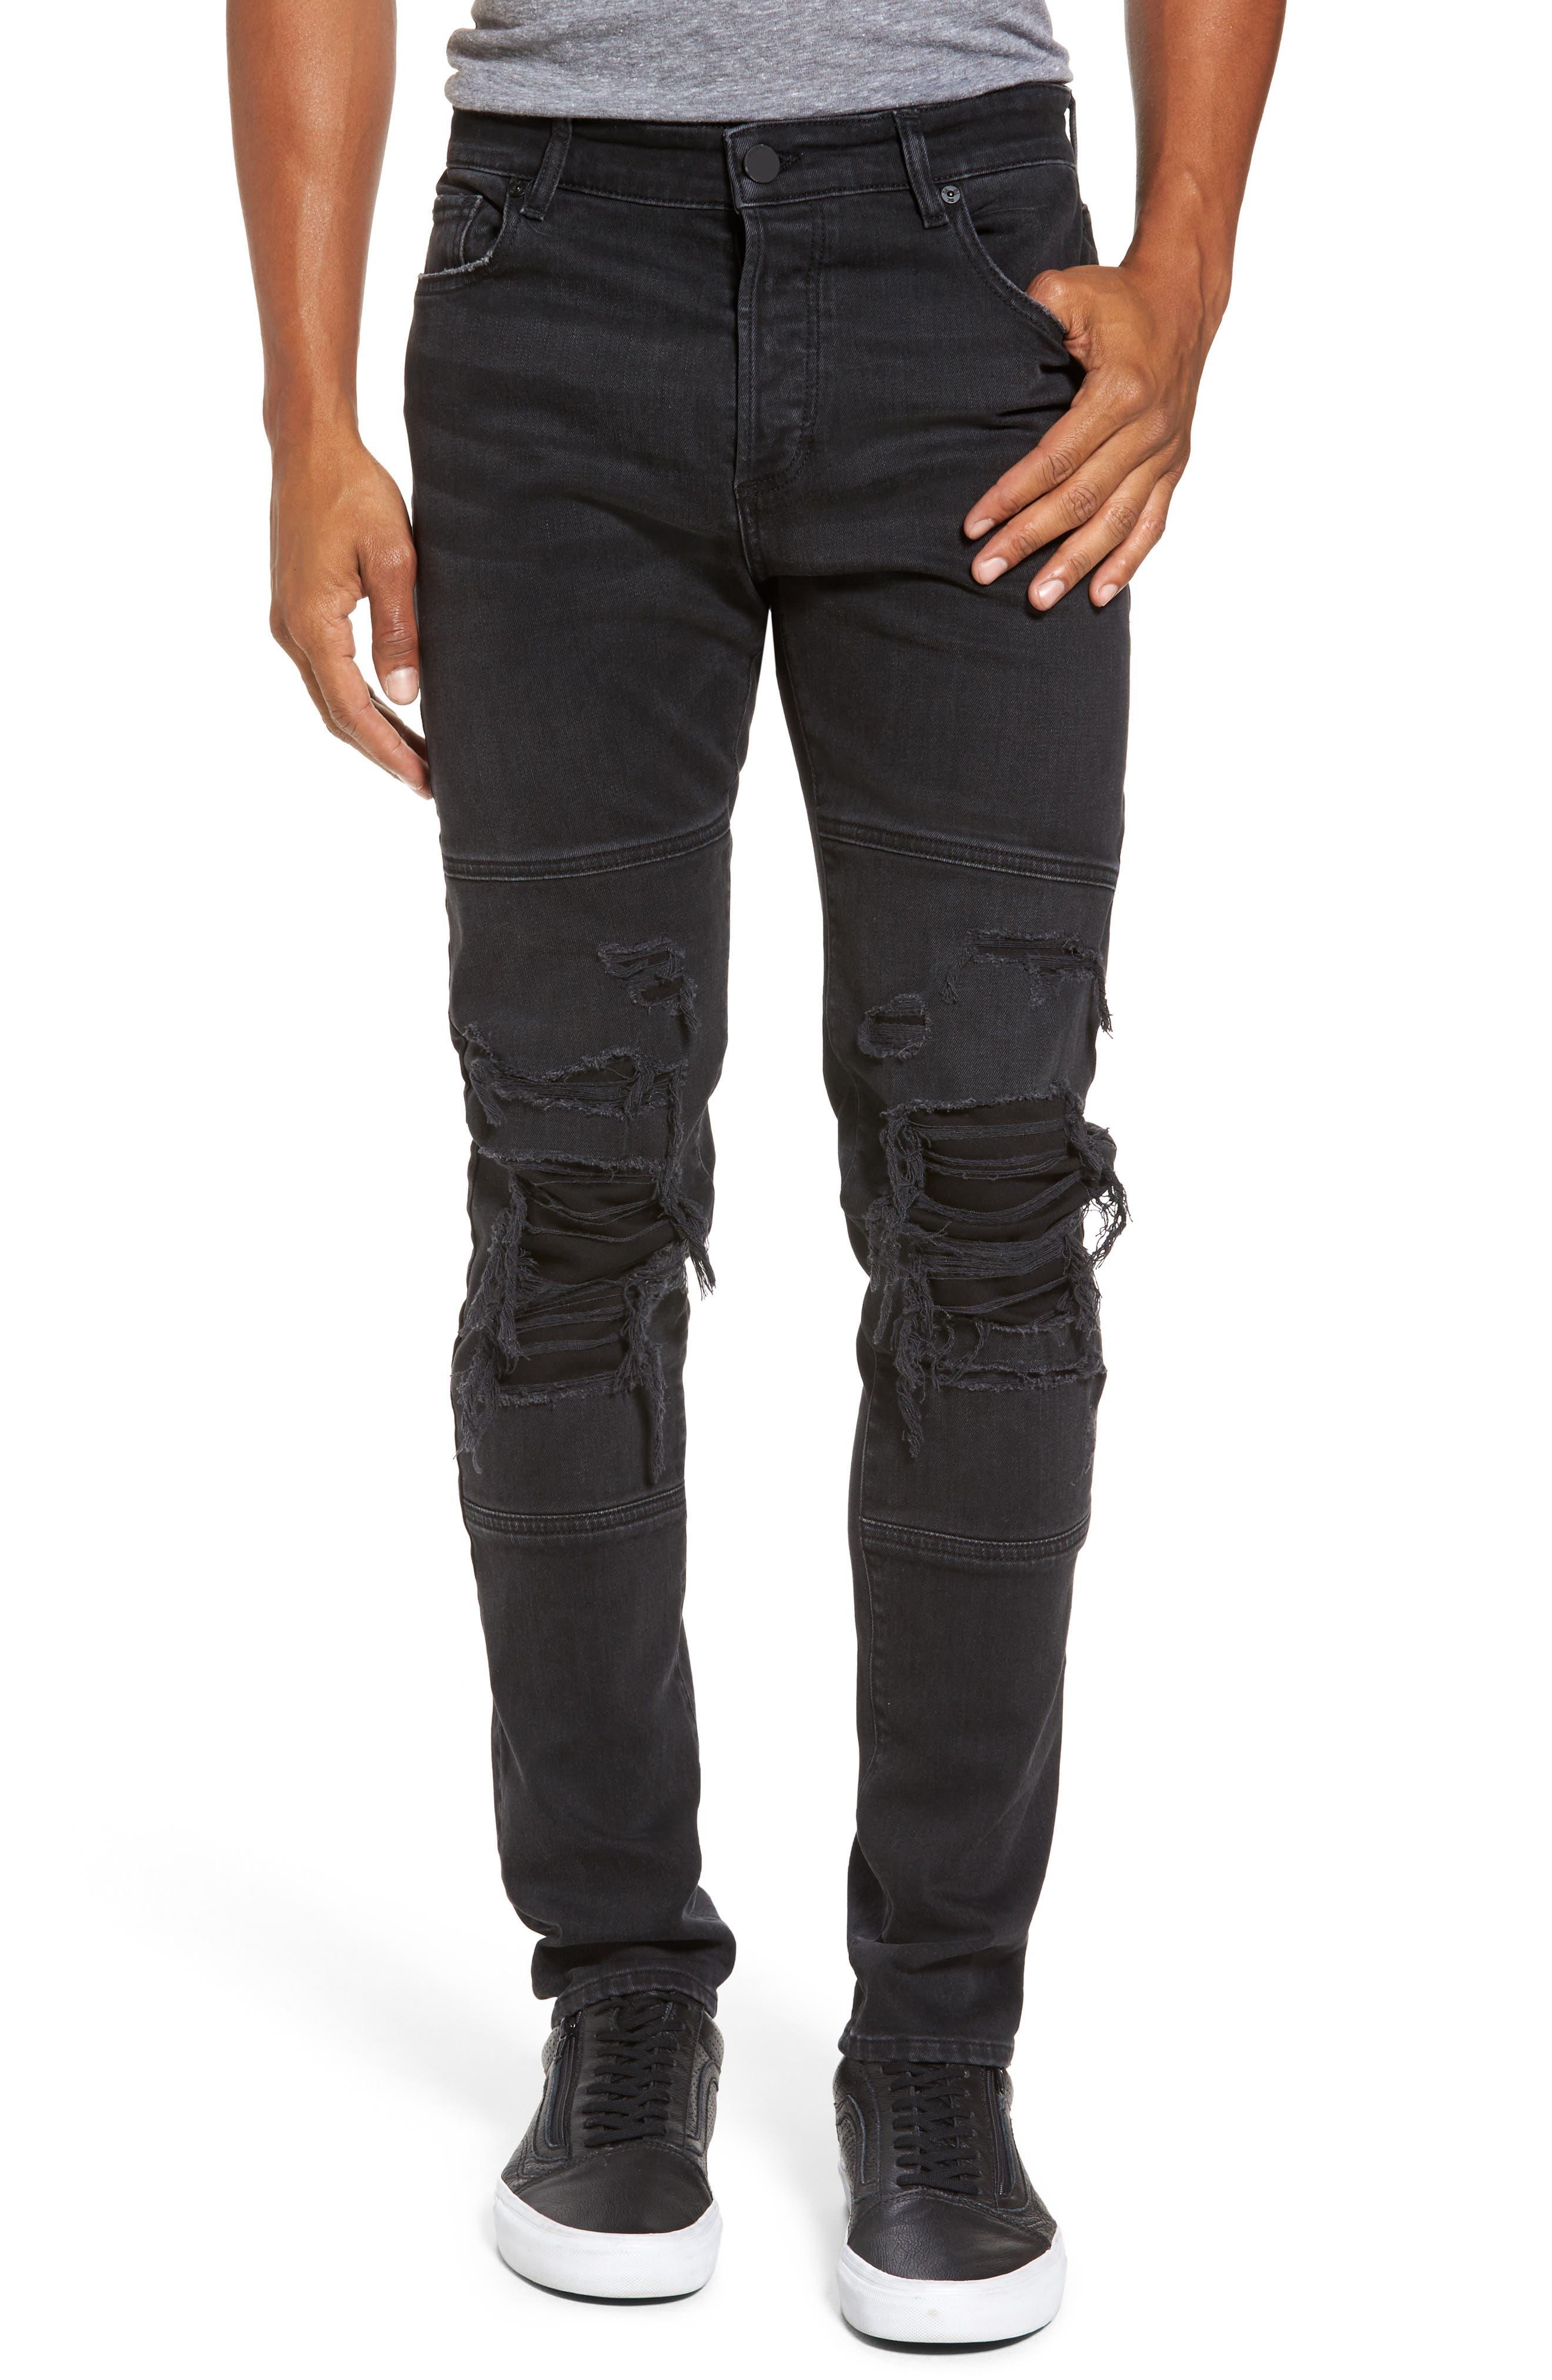 Hunter Skinny Jeans,                             Main thumbnail 1, color,                             001